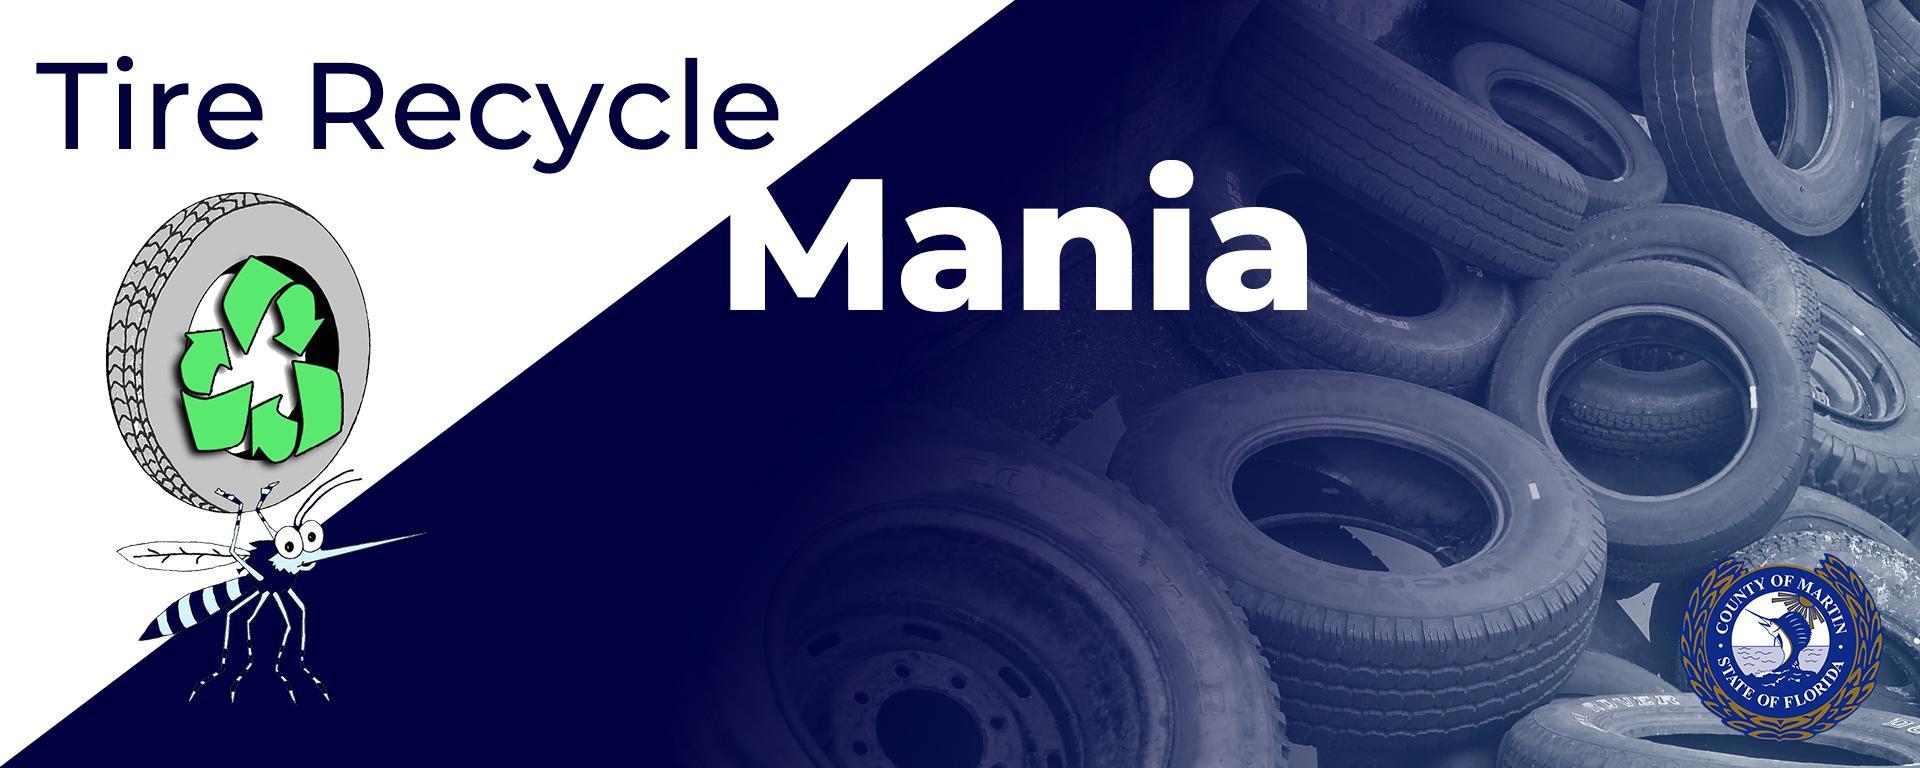 Tire Recycle Mania logo